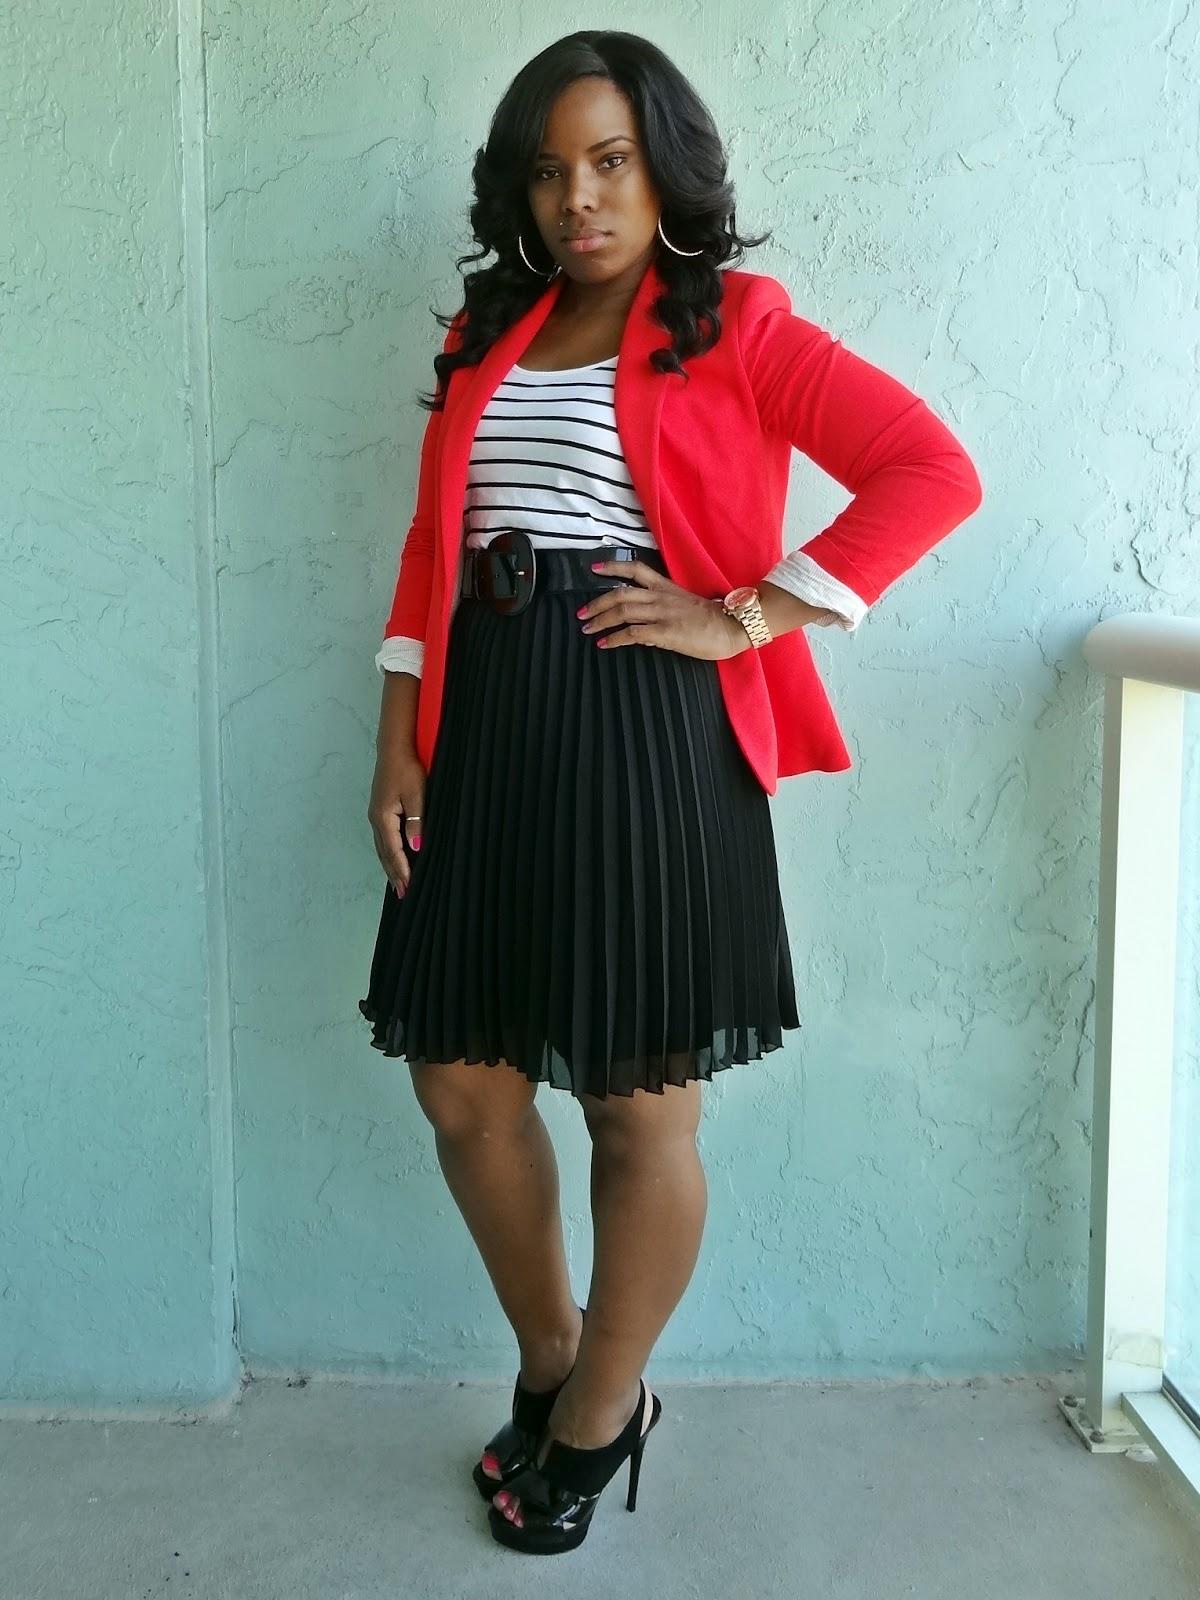 http://2.bp.blogspot.com/-v1q9qELeHZs/T9n9m9y09wI/AAAAAAAACd0/u0pakEBu9TQ/s1600/Kohls+pleated+skirt,+Zara+red+blazer,+Jessica+simpson+platform+pumps,+Janet+Collection+Utopia+Remy+Lacefront+wig.JPG